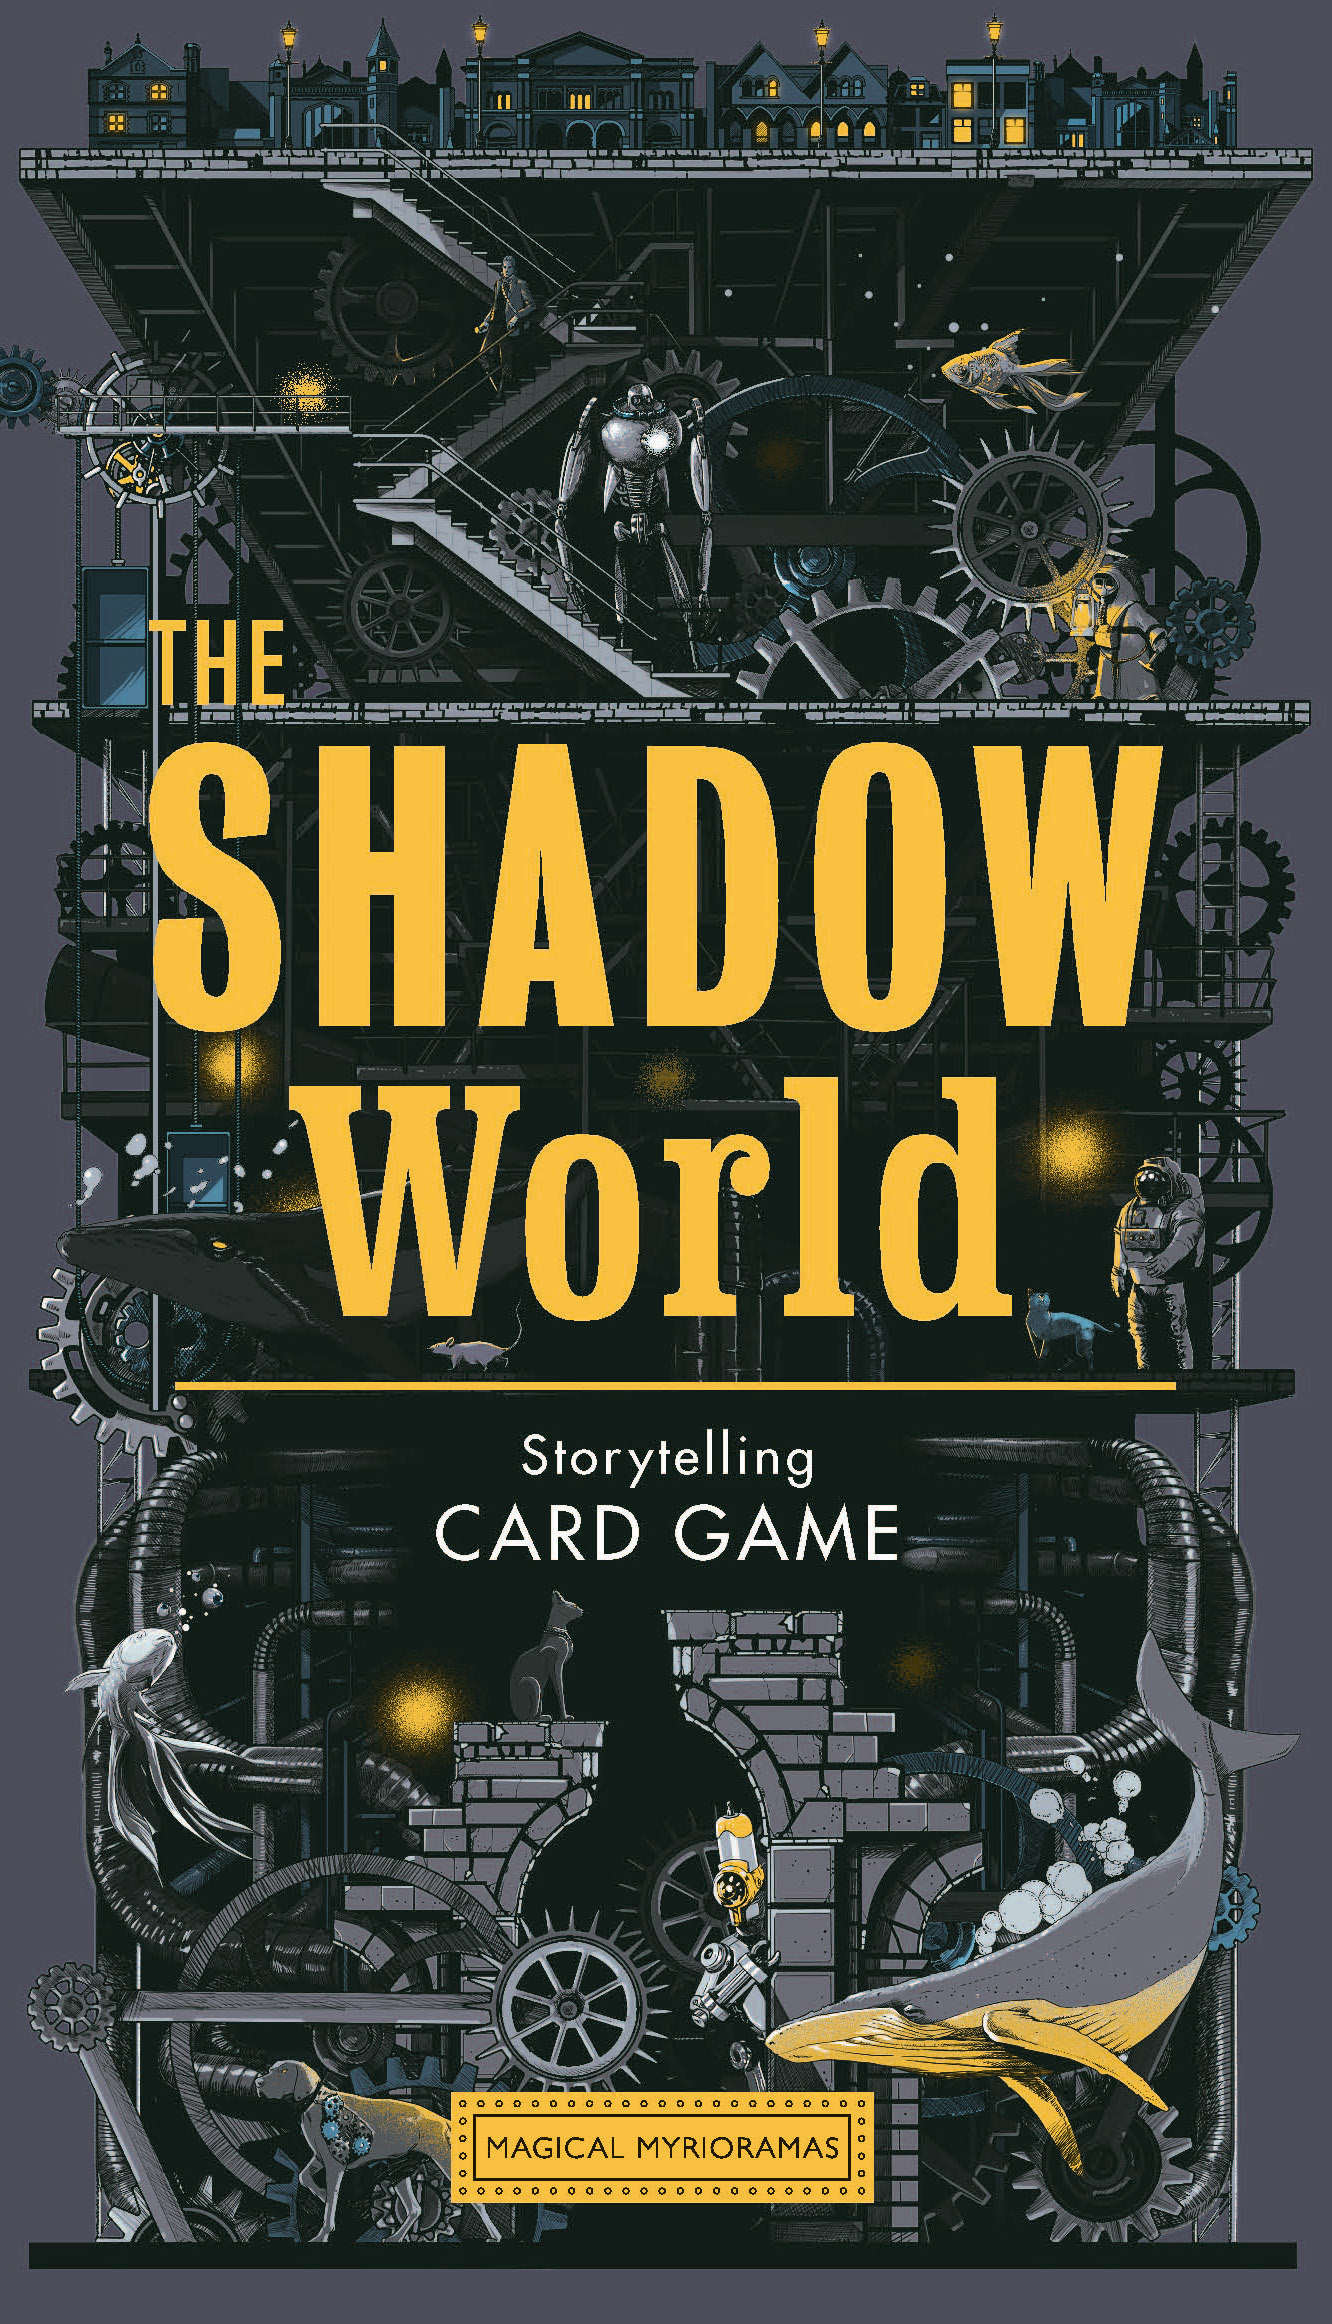 THE SHADOW WORLD A SCI-FI STORYTELLING CARD GAME (MAGICAL MYRIORAMAS) /ANGLAIS